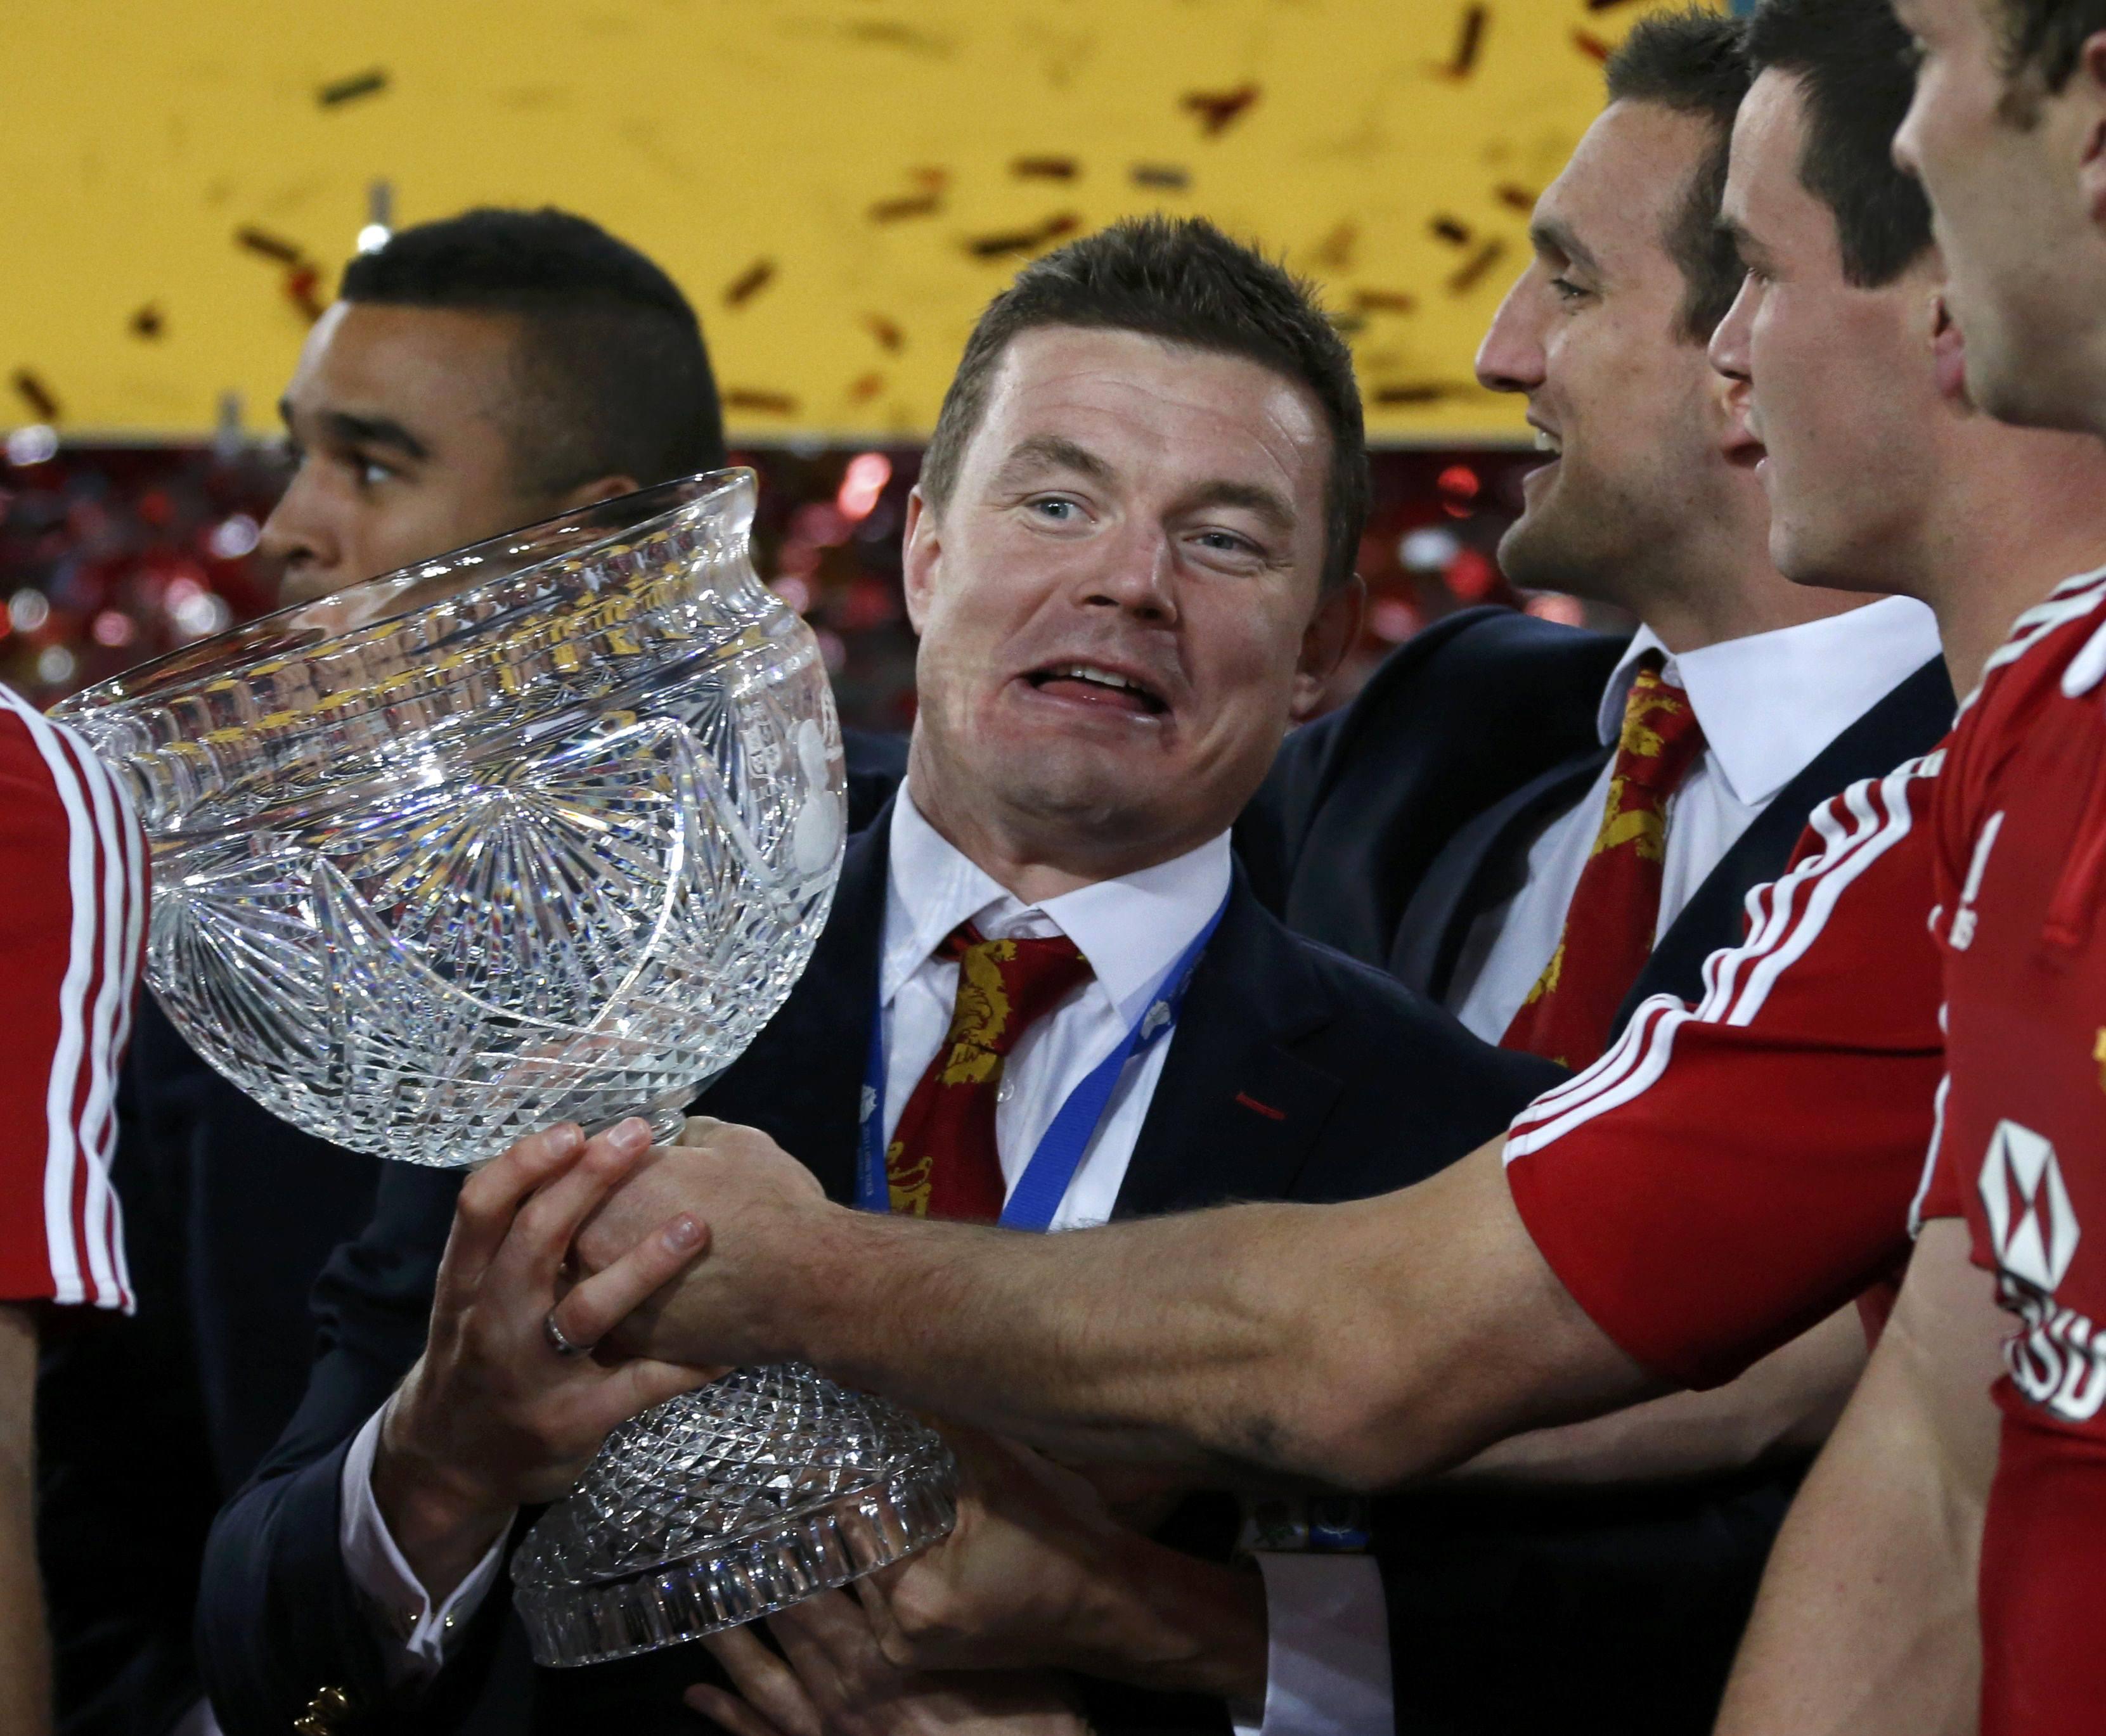 Jonny Sexton: British and Irish Lions won Australia series for Brian O'Driscoll